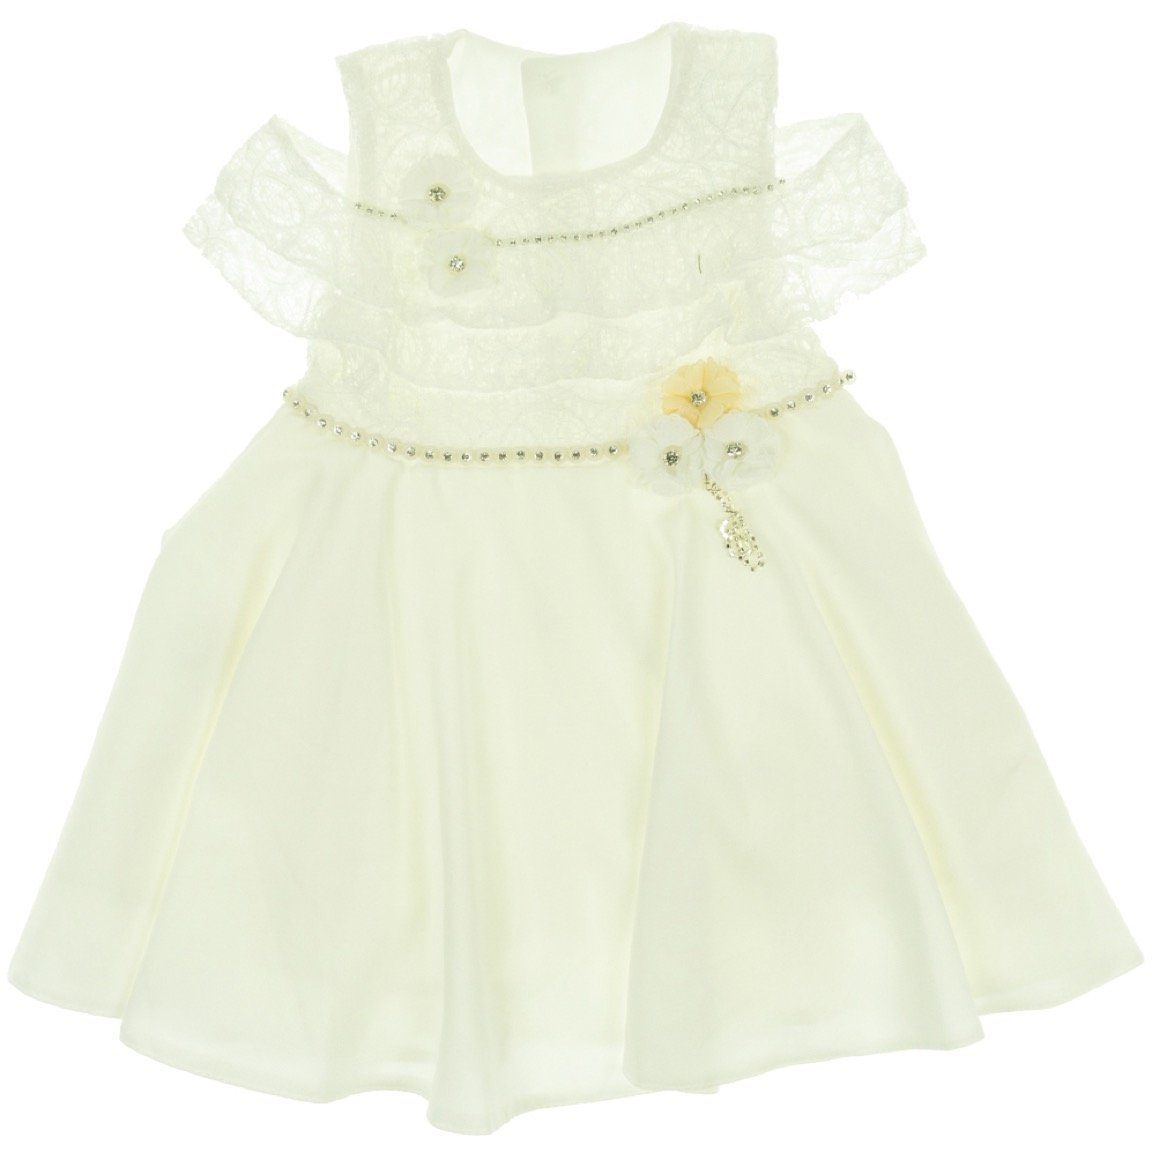 GVN παιδικό αμπιγιέ φόρεμα «Pulchritude»